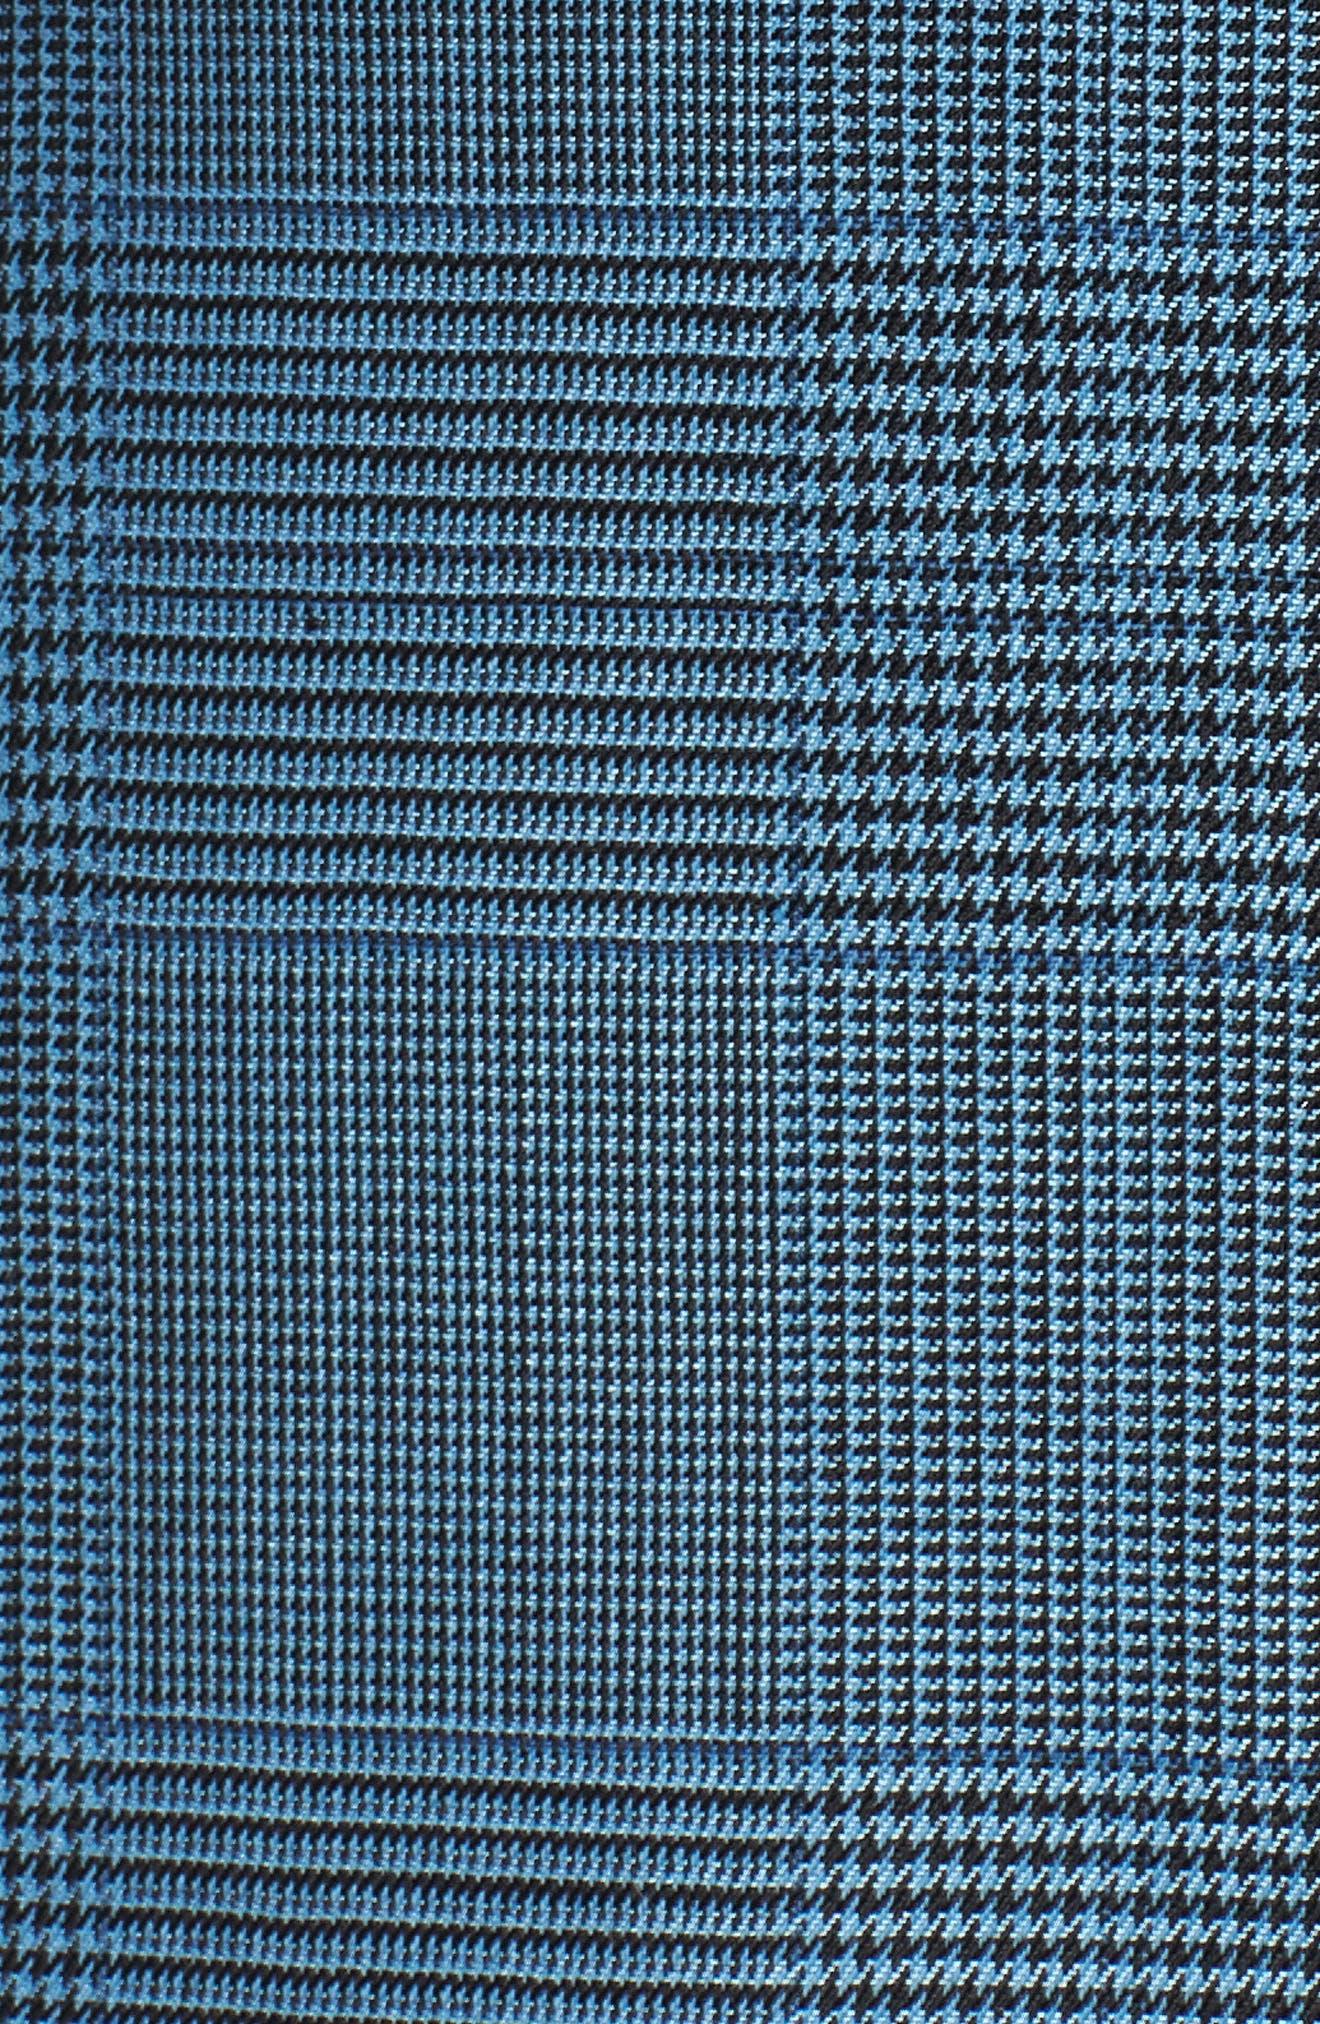 Tofilia Glencheck Slim Fit Trousers,                             Alternate thumbnail 5, color,                             Sailor Blue Fantasy